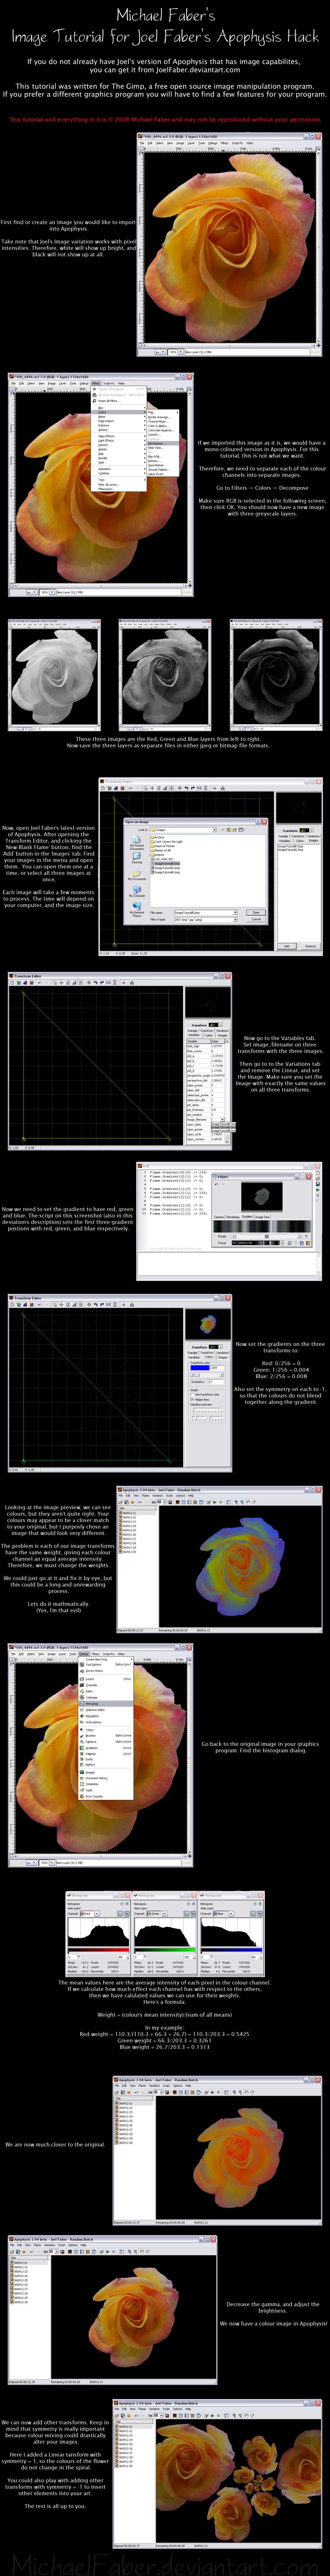 Image tutorial apophysis jf by michaelfaber photoshop image tutorial apophysis jf by michaelfaber baditri Gallery